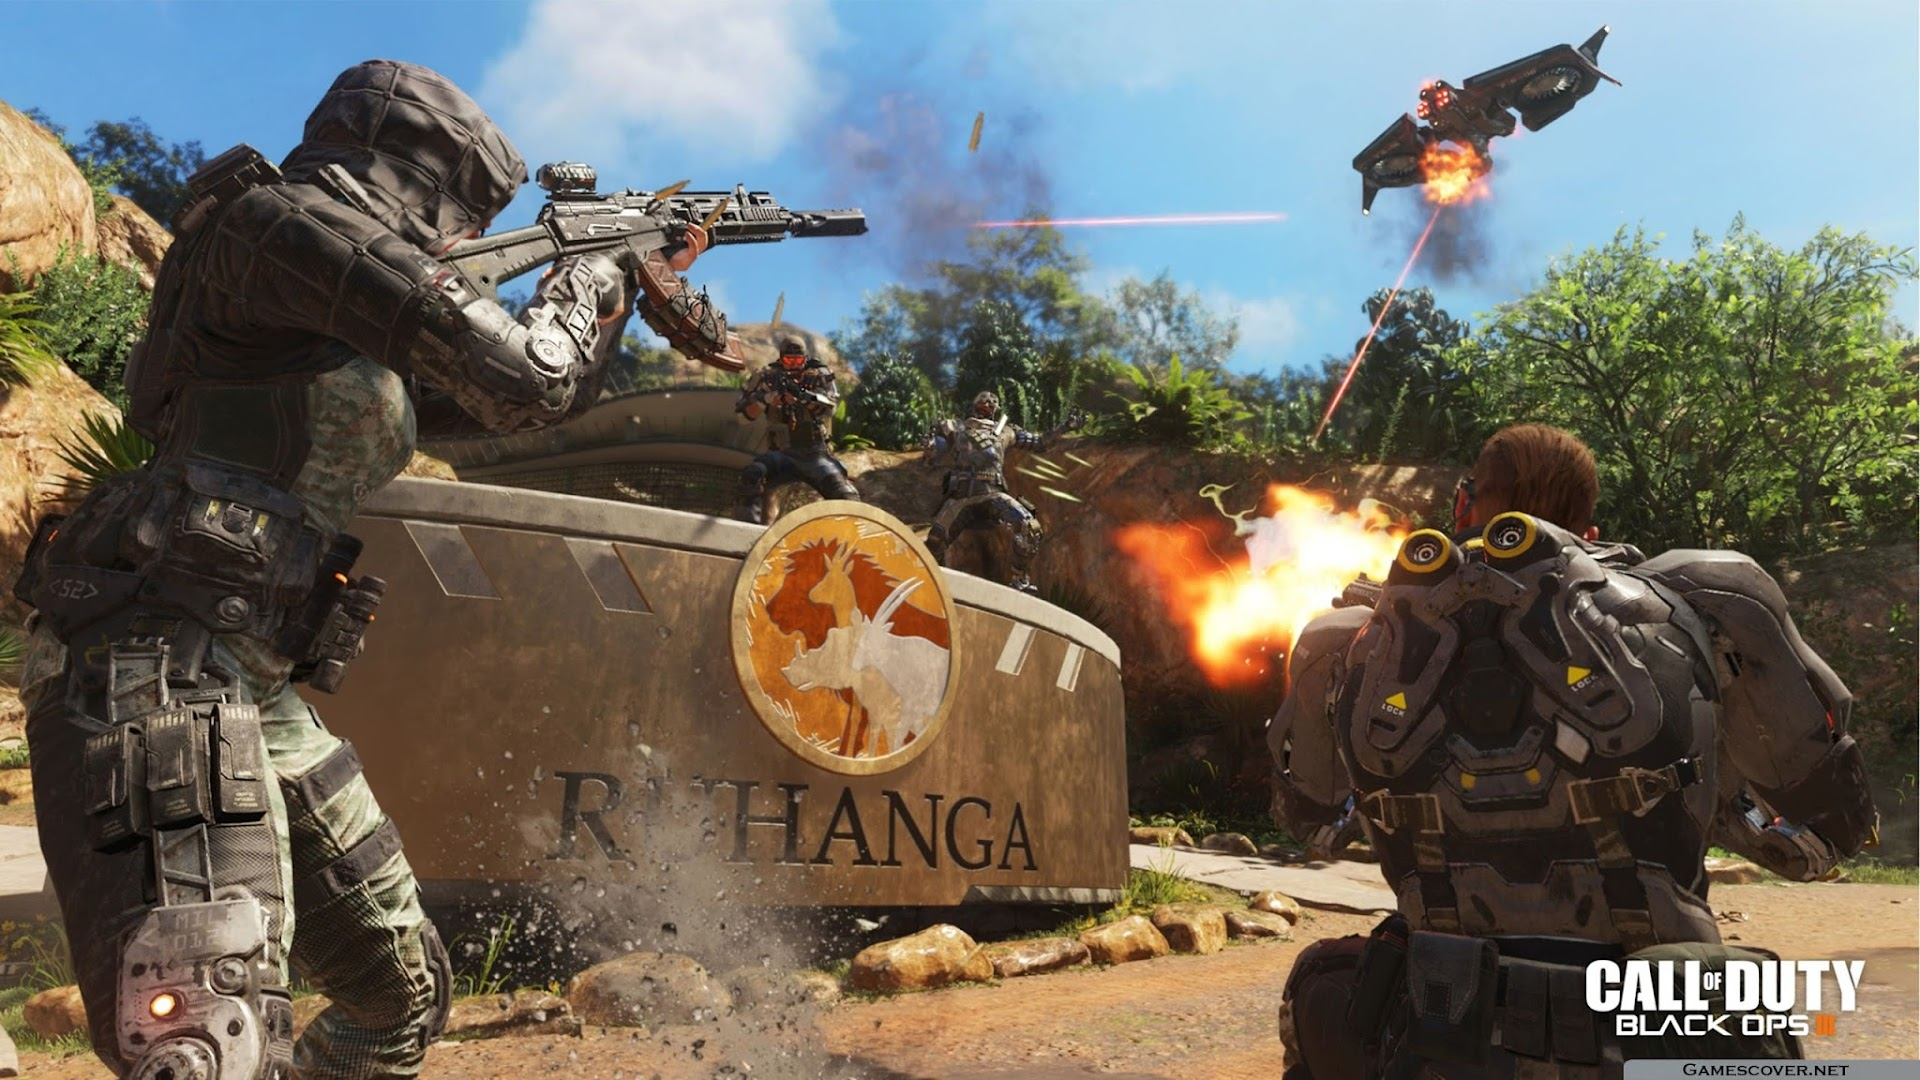 Cod Black Ops 3 Wallpaper: Call Of Duty Black Ops III Wallpapers